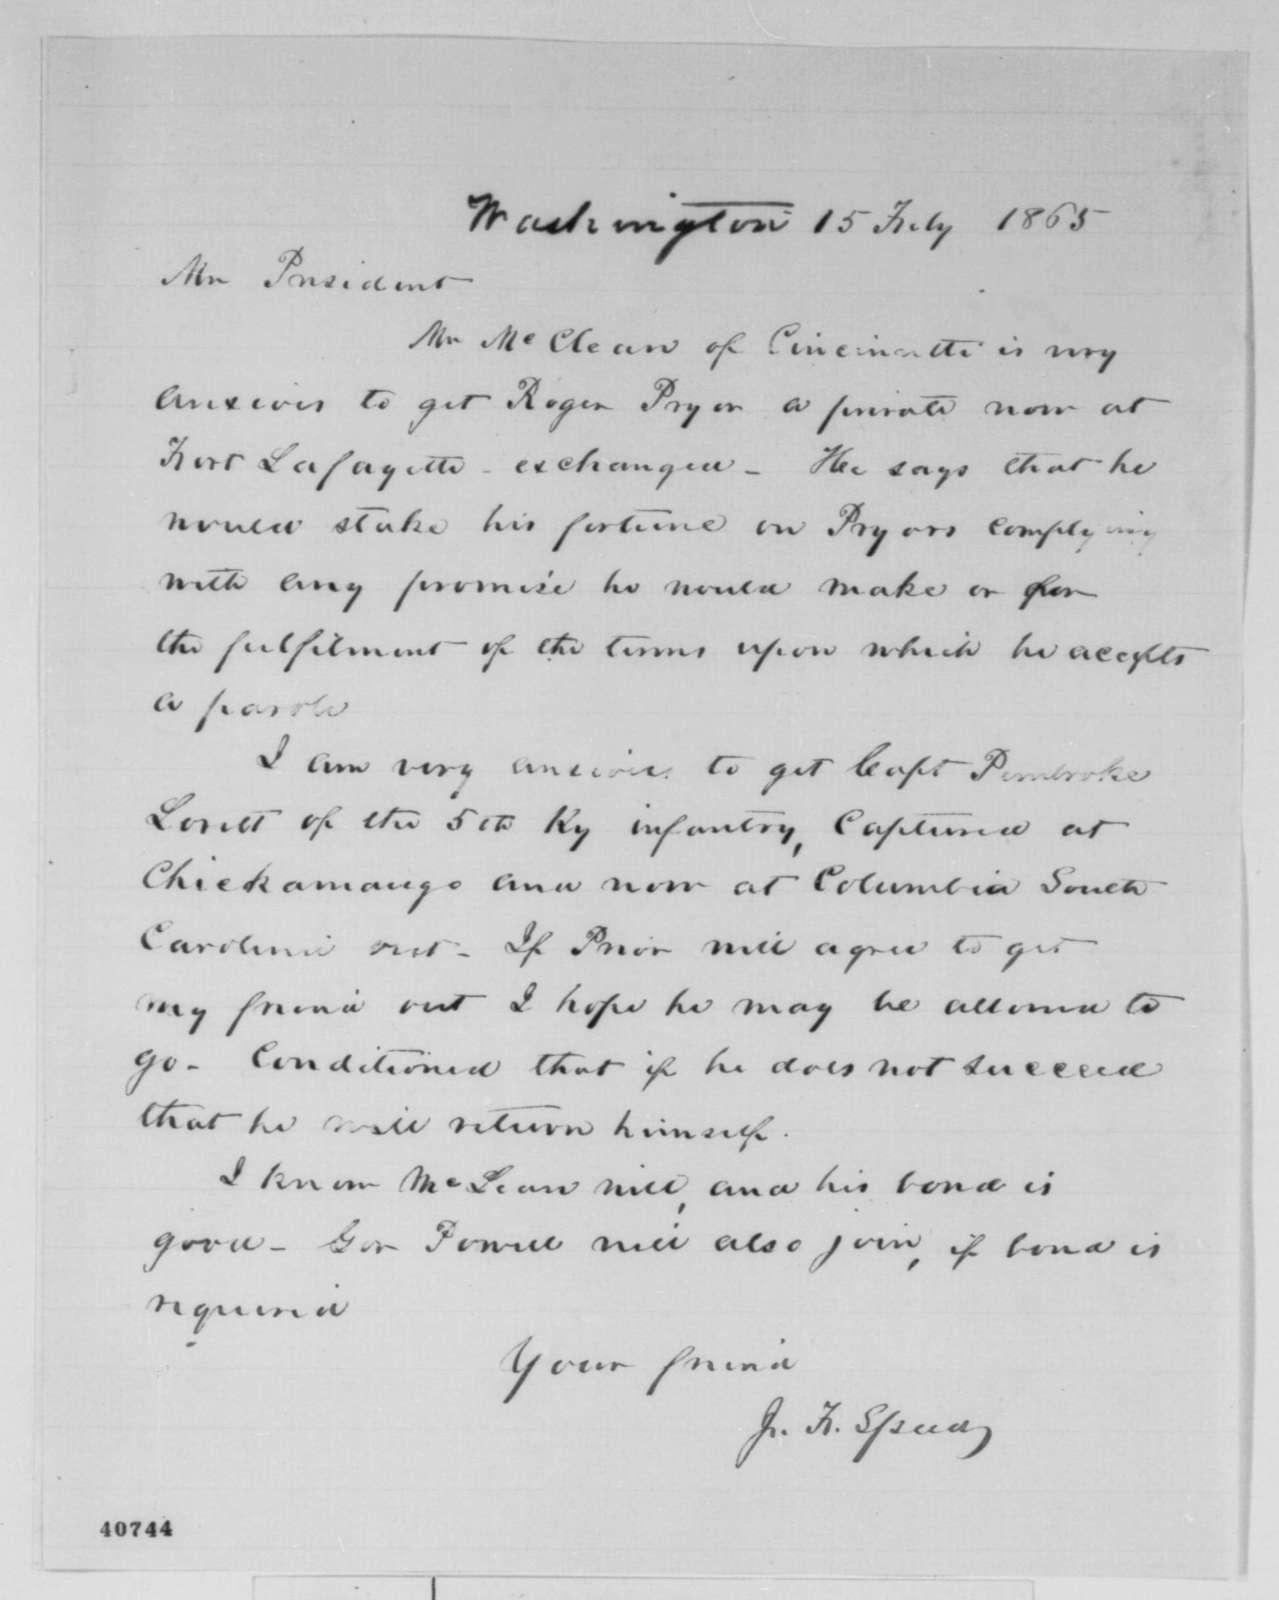 Joshua F. Speed to Abraham Lincoln, Wednesday, February 15, 1865  (Prisoner exchange)